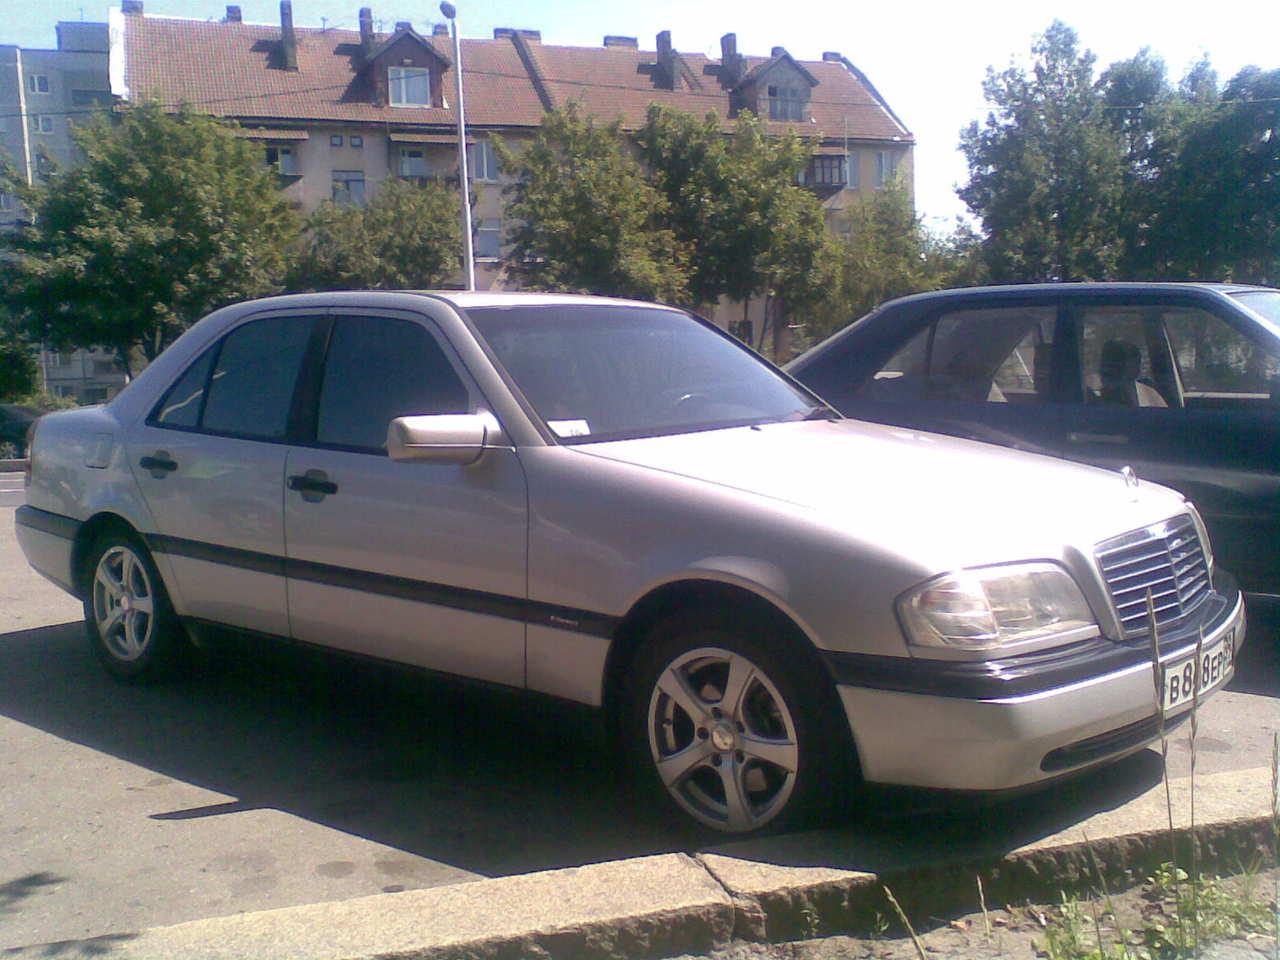 1996 mercedes benz c class pictures 1800cc gasoline fr for 1996 mercedes benz c class